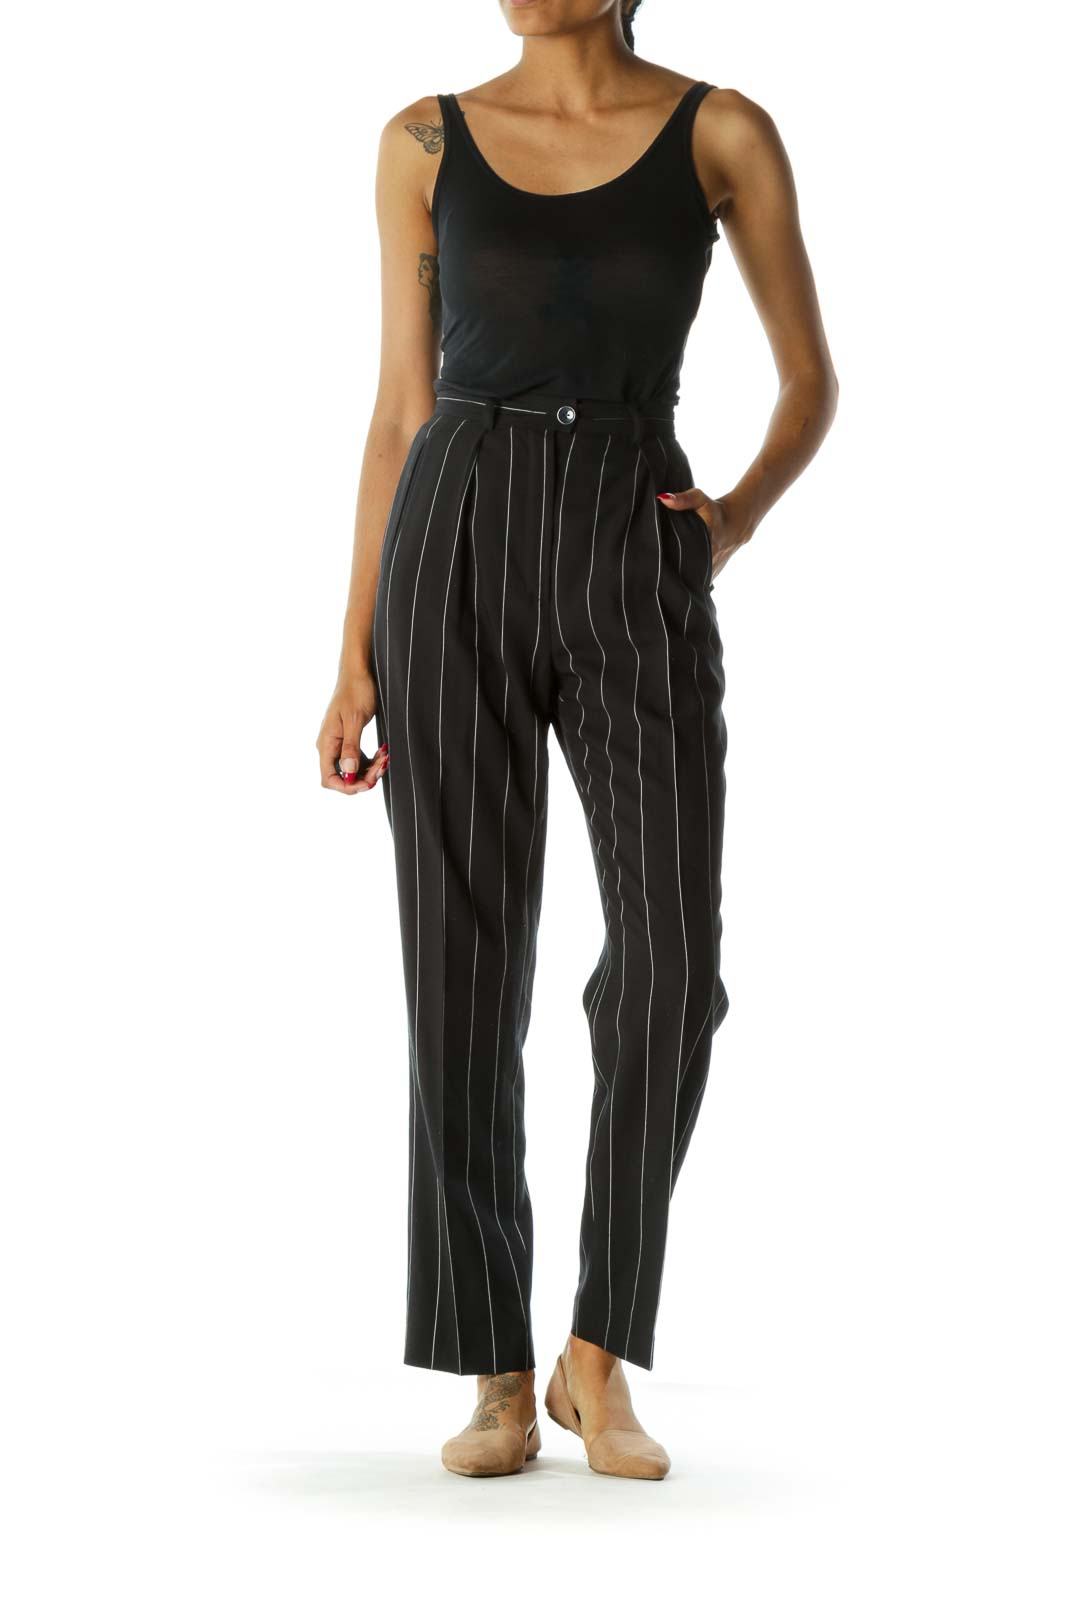 Navy & White Pinstripe 100% Pure Wool Designer High-Waisted Pants